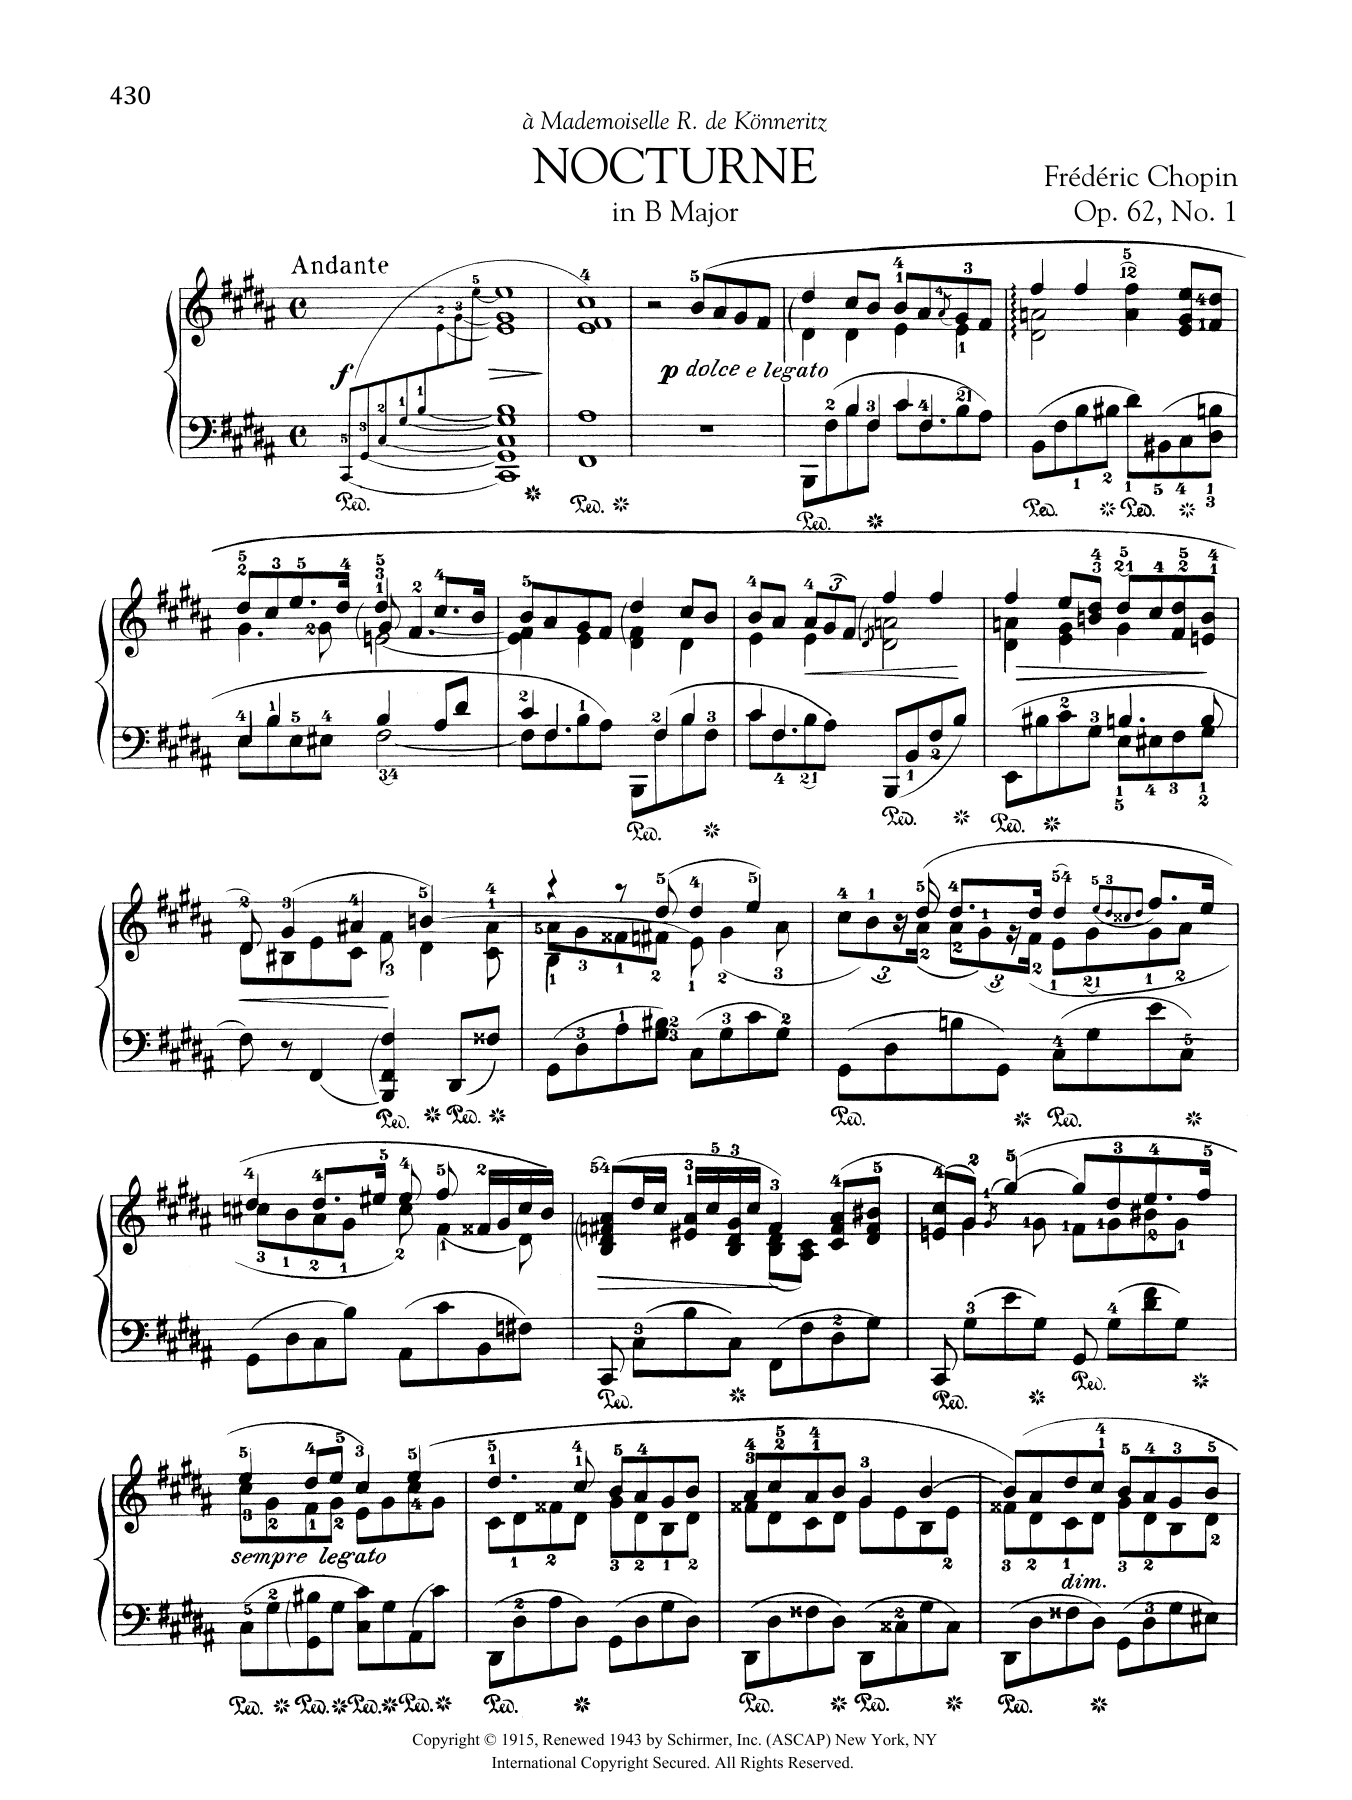 Nocturne in B Major, Op. 62, No. 1 Sheet Music